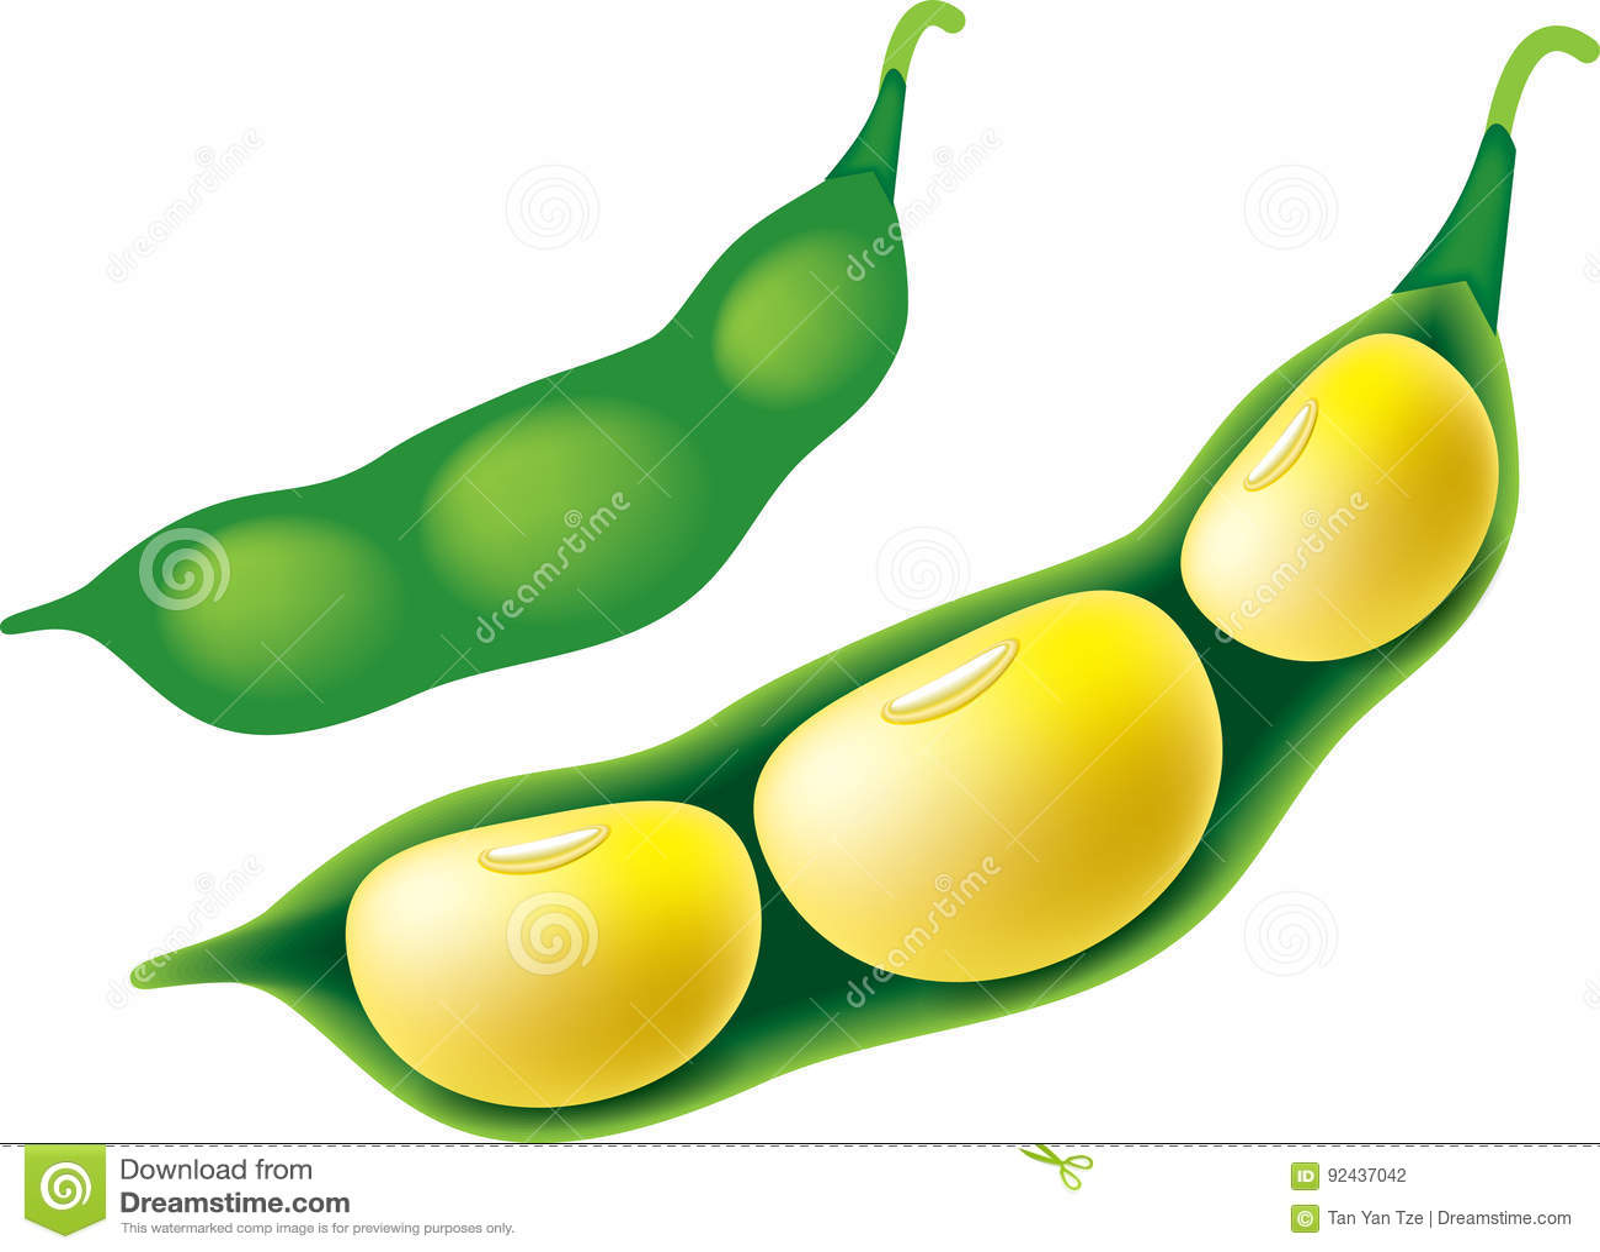 soya bean stock illustration illustration of clipart 92437042 rh dreamstime com Corn Clip Art Soy Sauce Clip Art